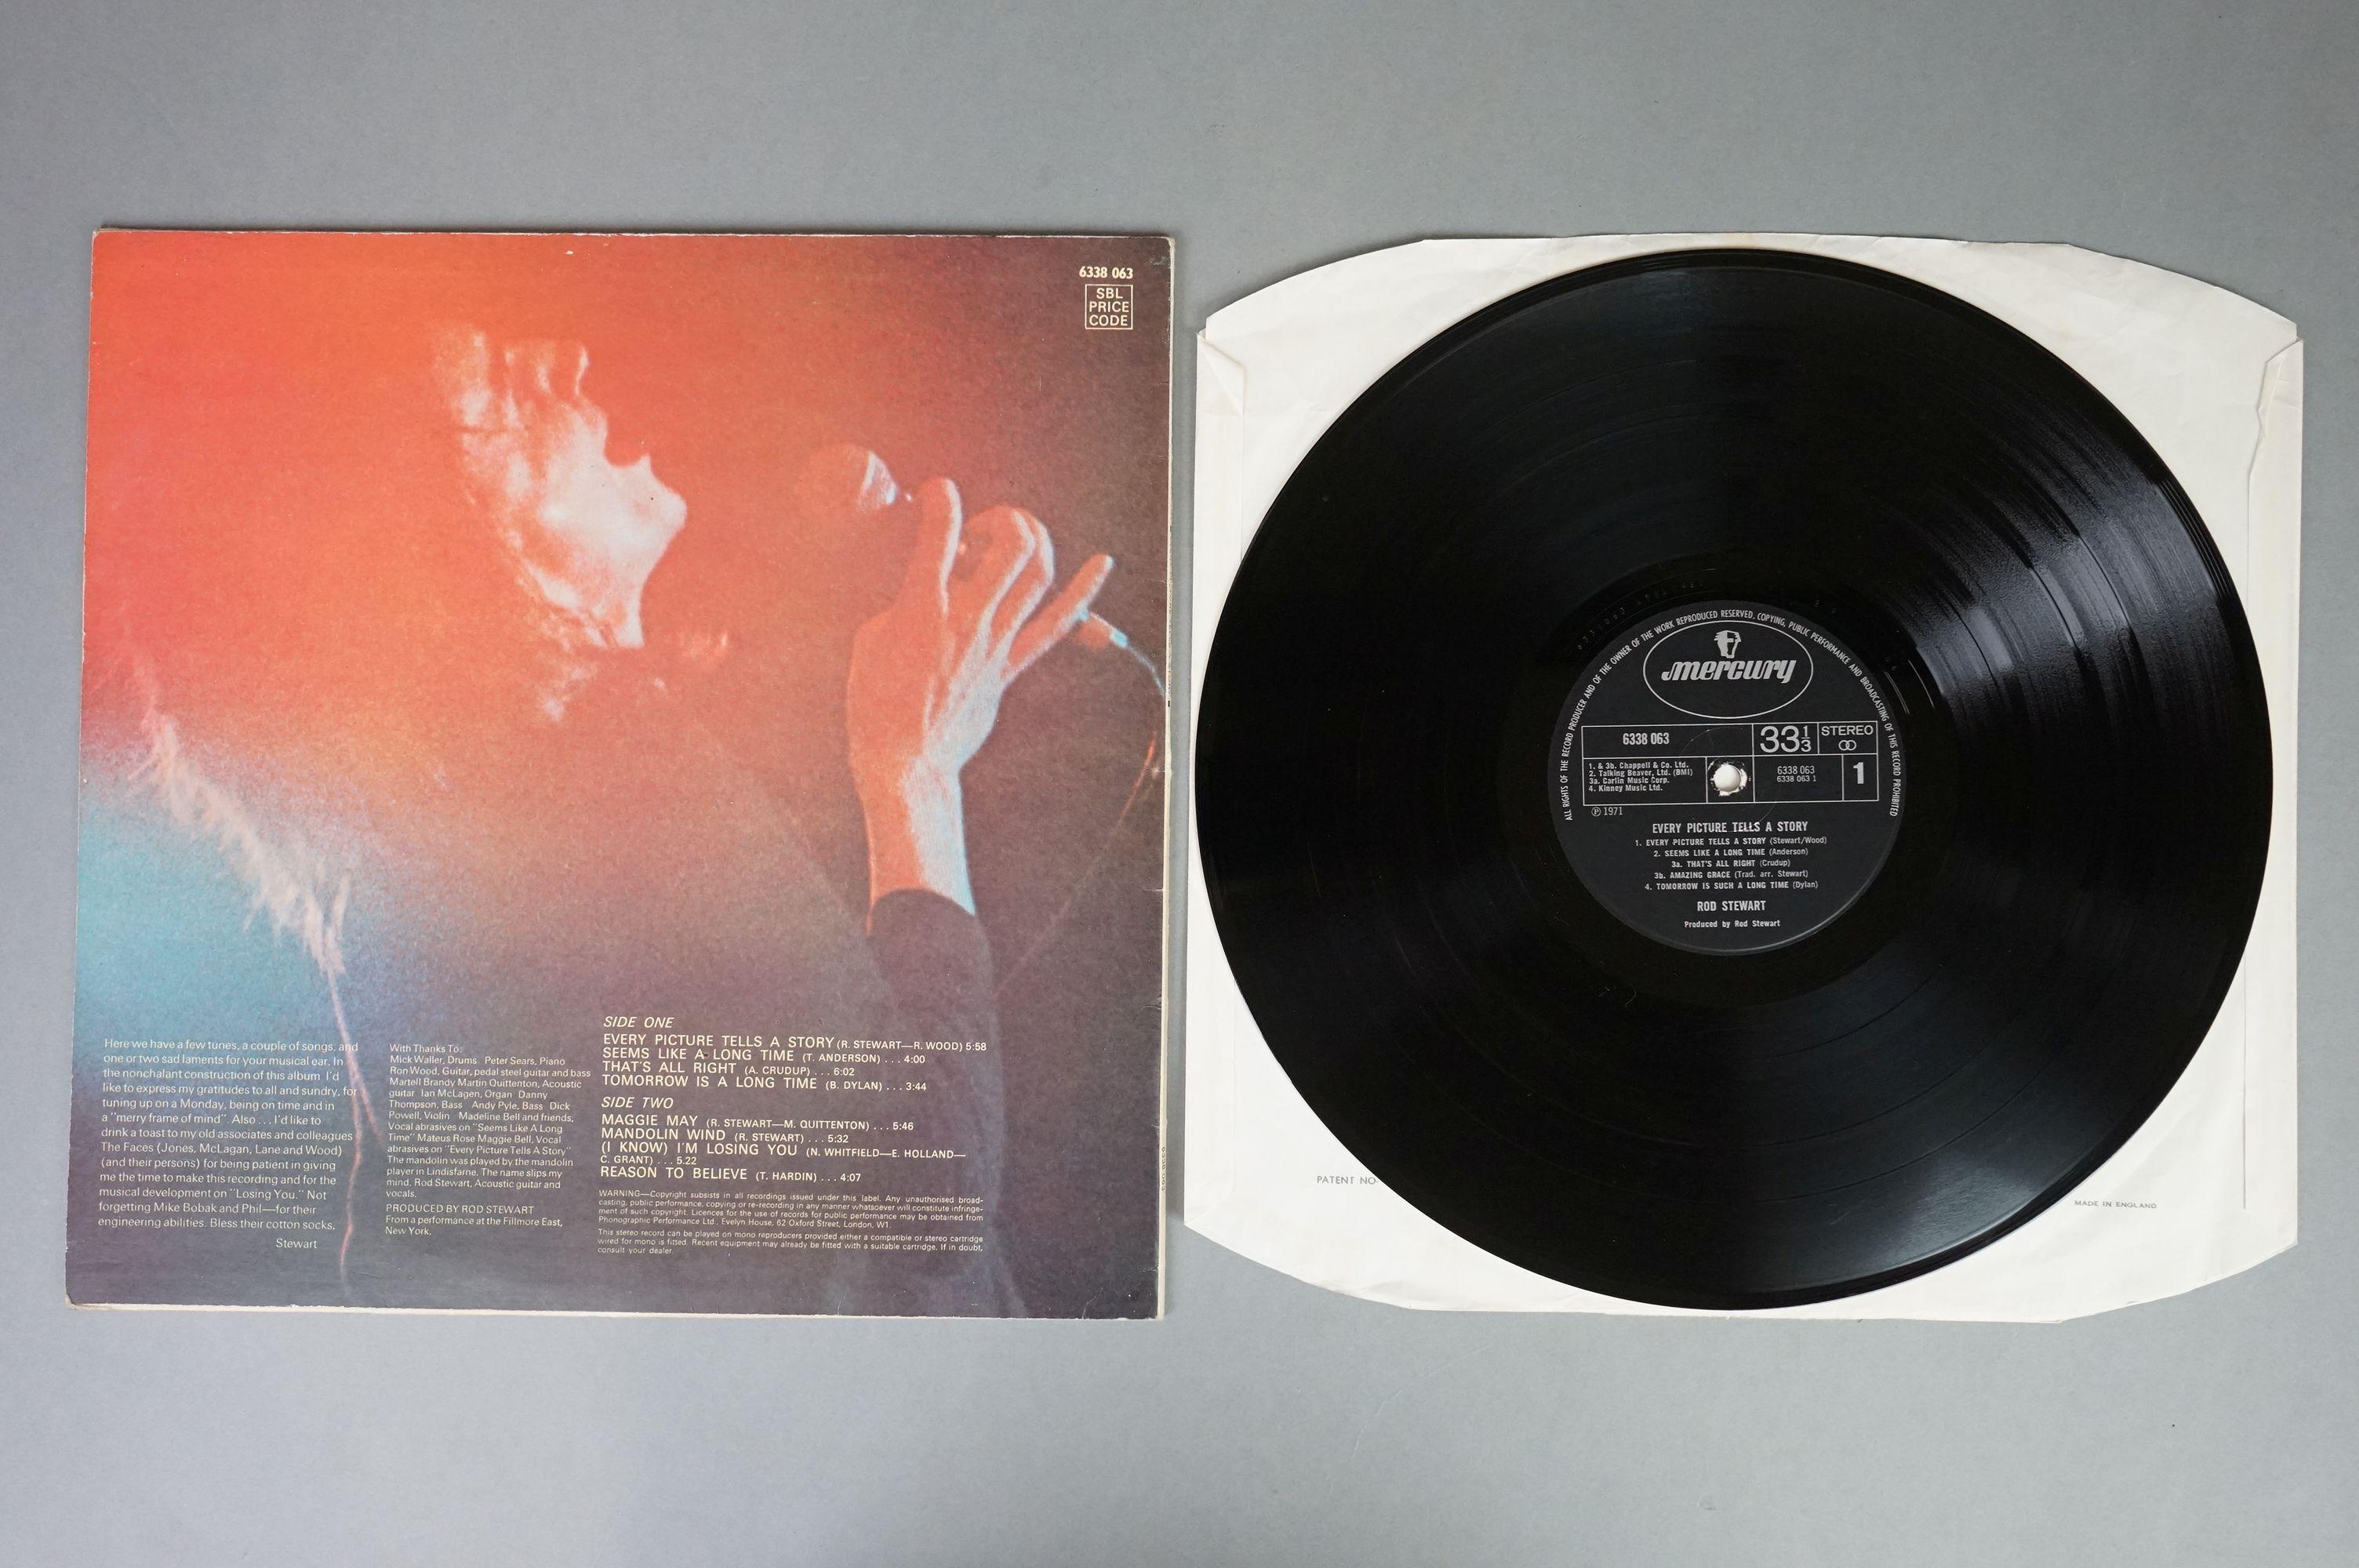 Vinyl - Rod Stewart 4 LP's to include An Old Raincoat Won't Ever Let You Down (Vertigo VO4) gatefold - Image 8 of 14